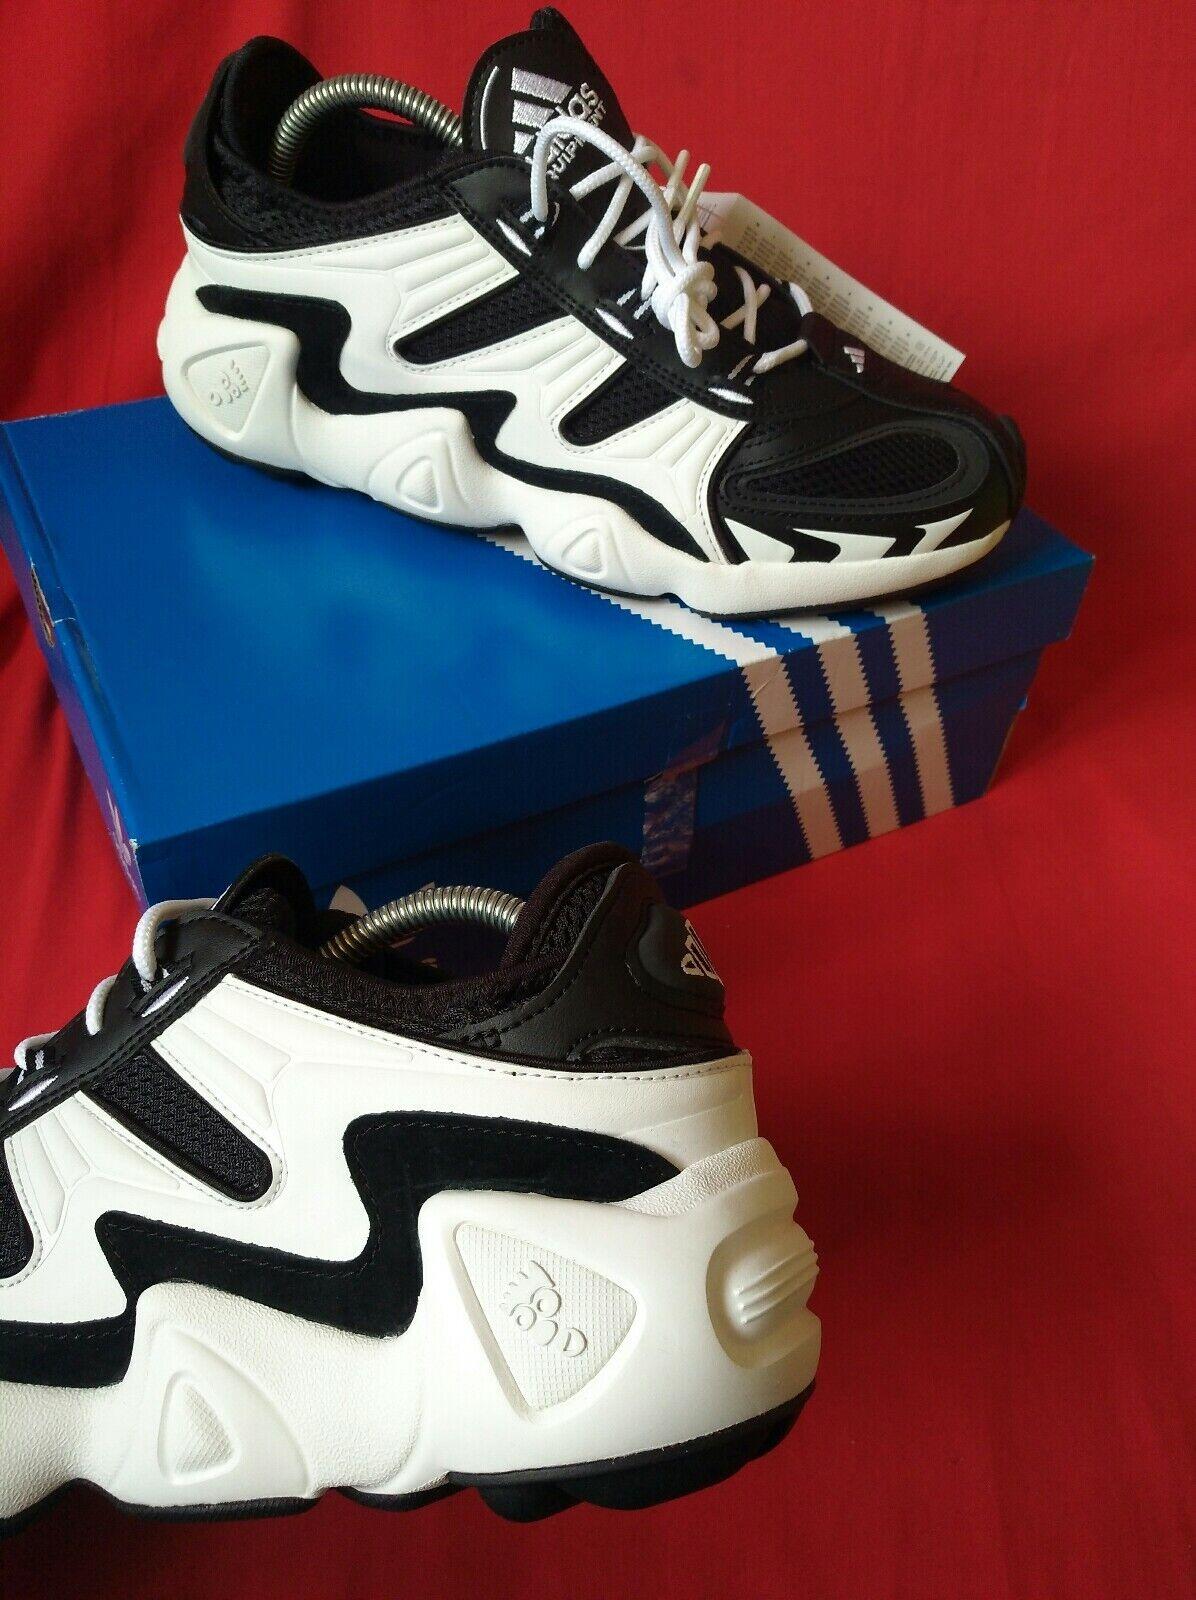 Adidas  legend Größe 9 Originals  authentic 100% torsion system